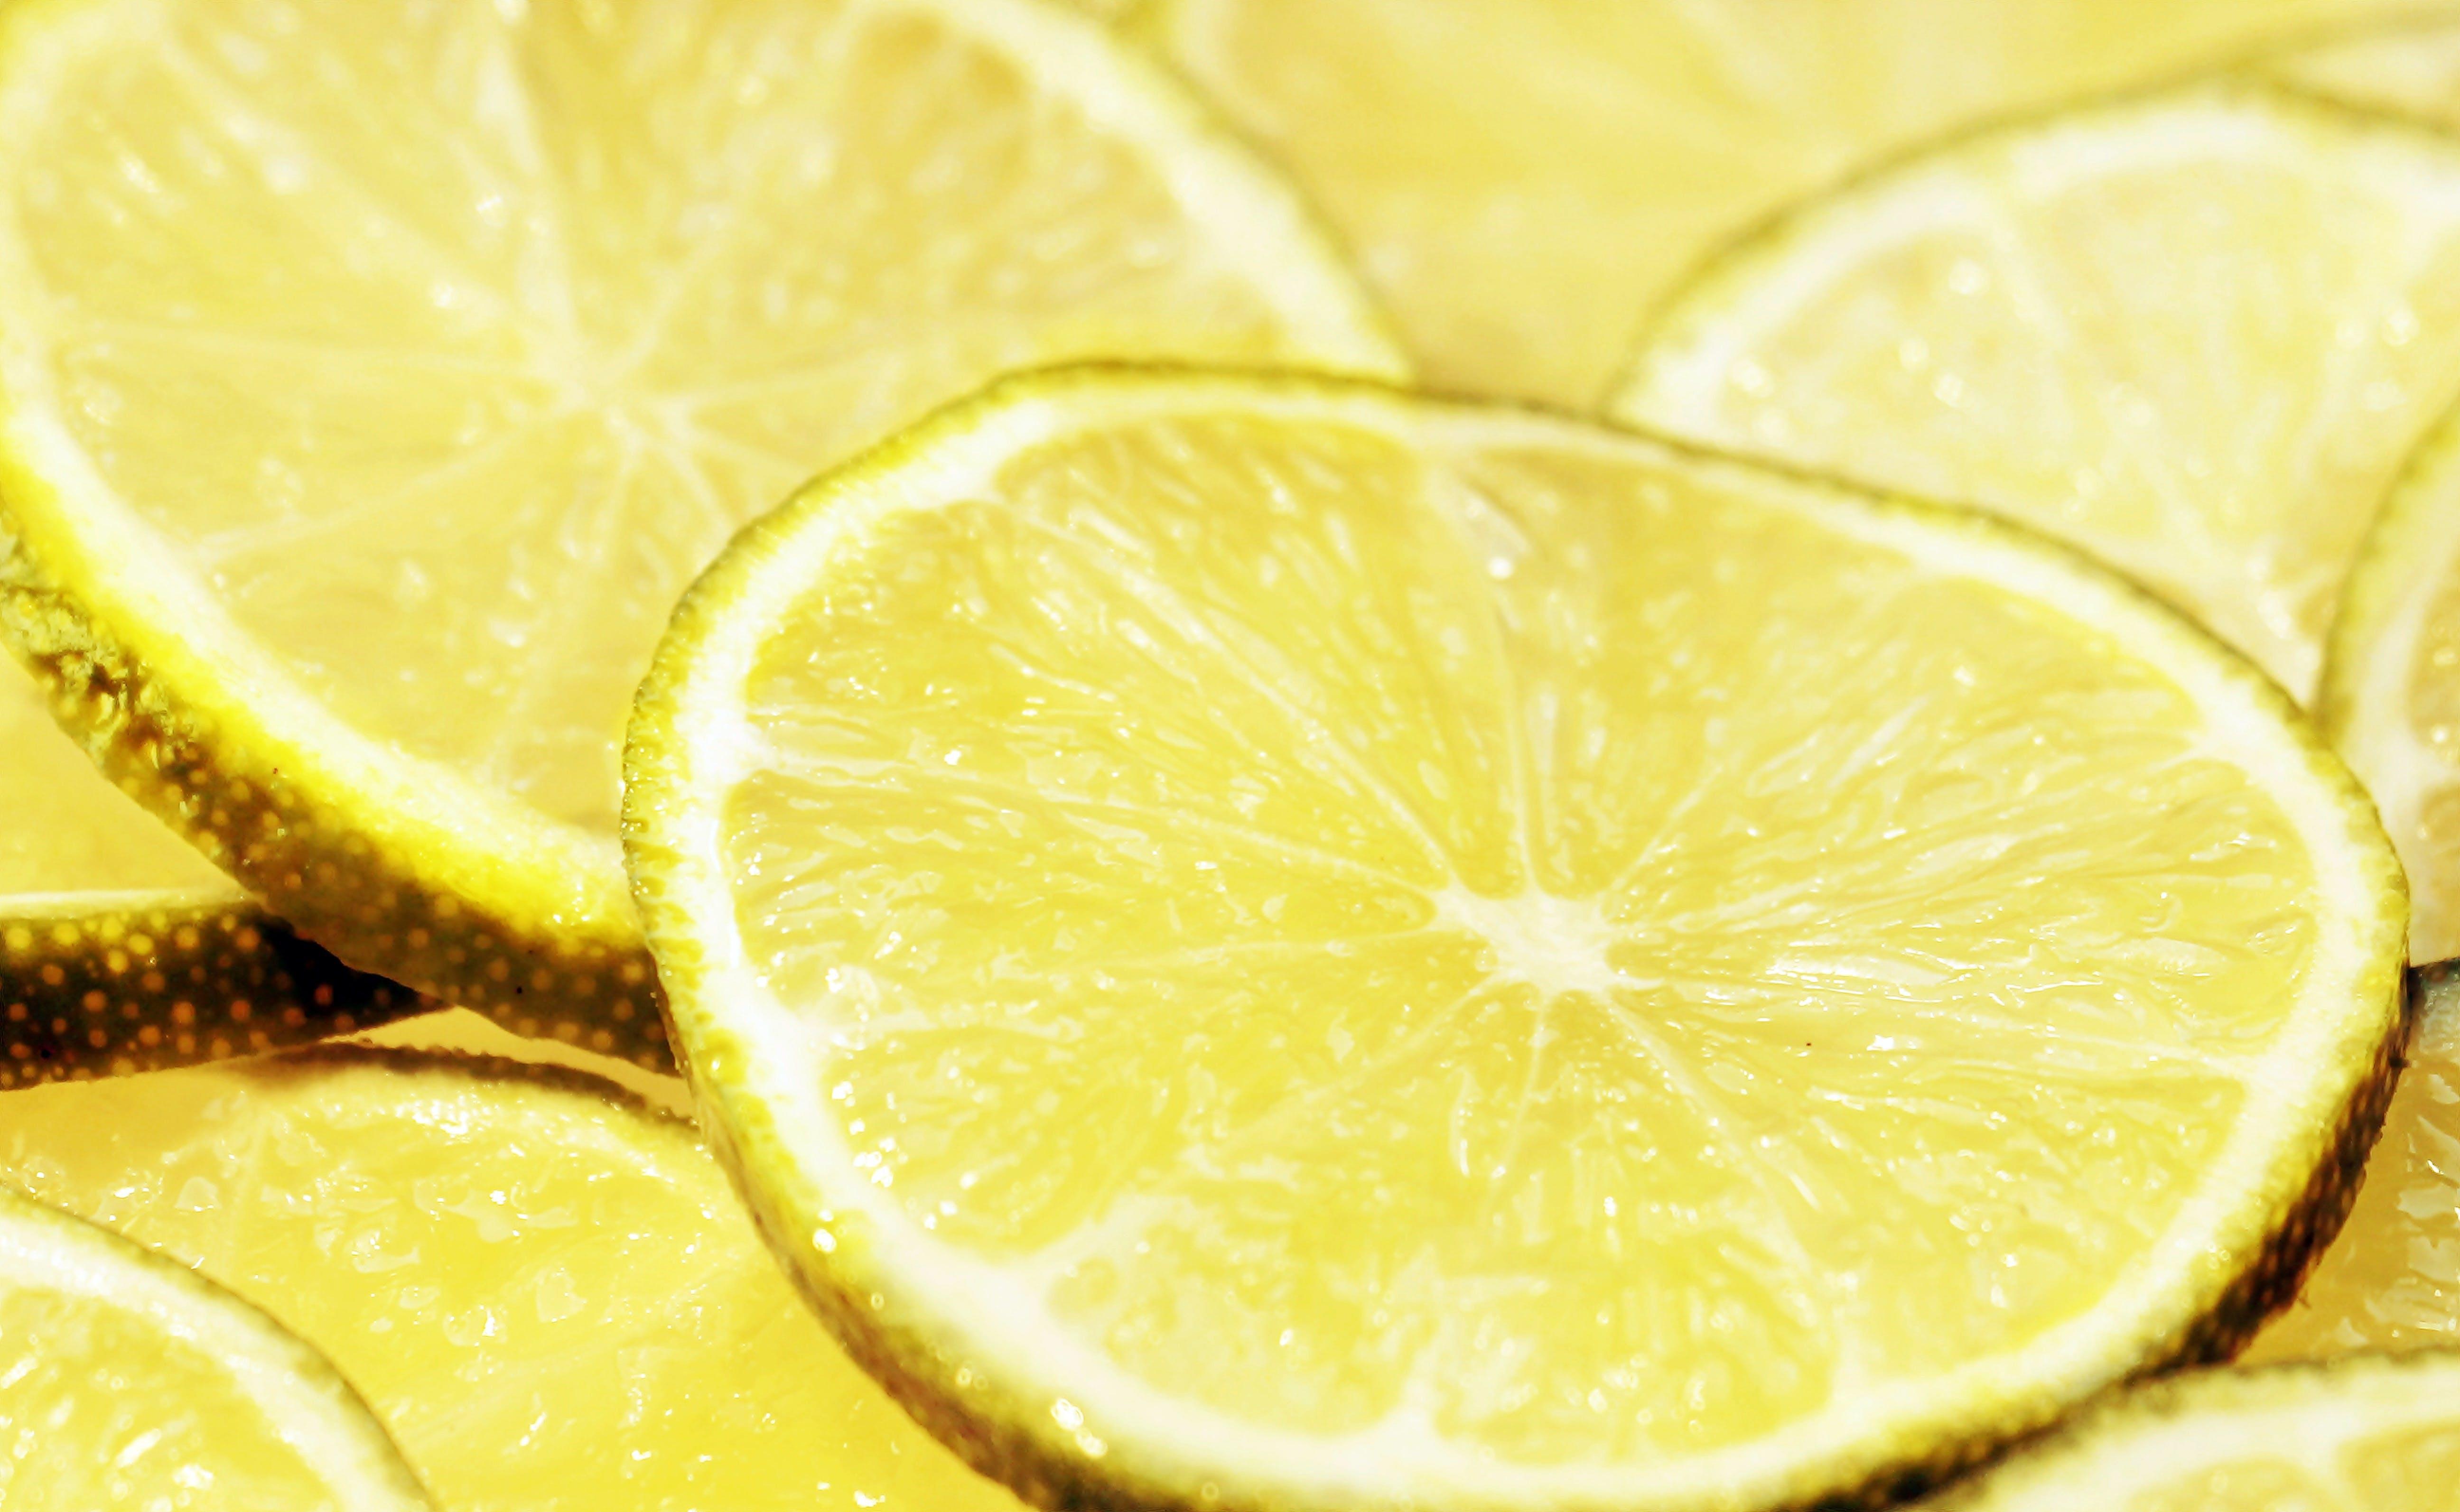 citrus, citrus fruit, close-up